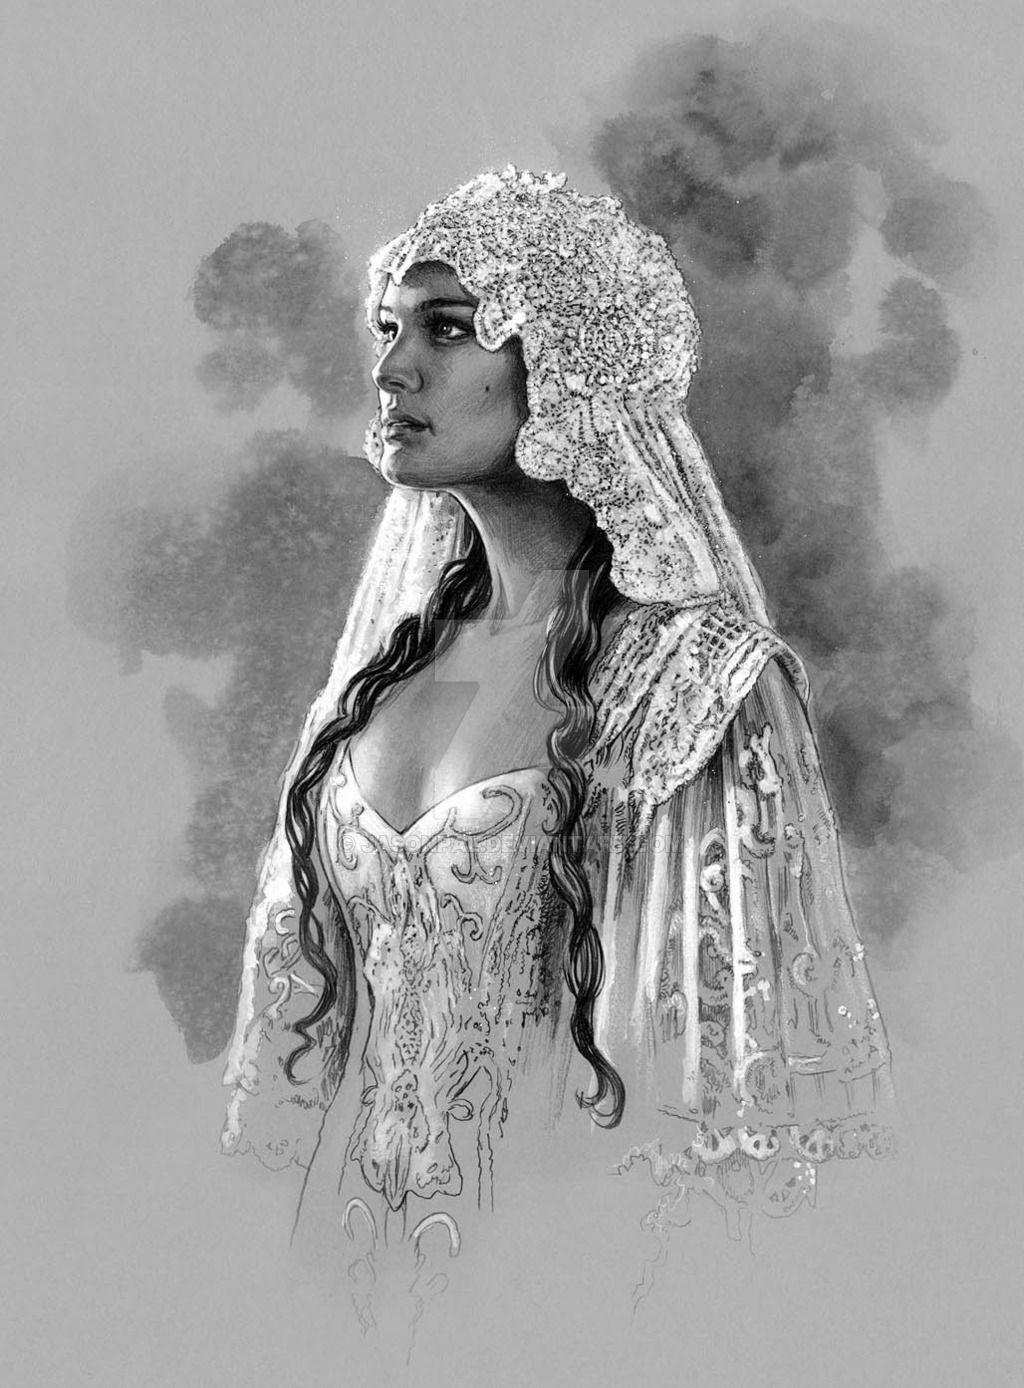 Padme Wedding Gown By Jasonpaldeviantart On DeviantArt